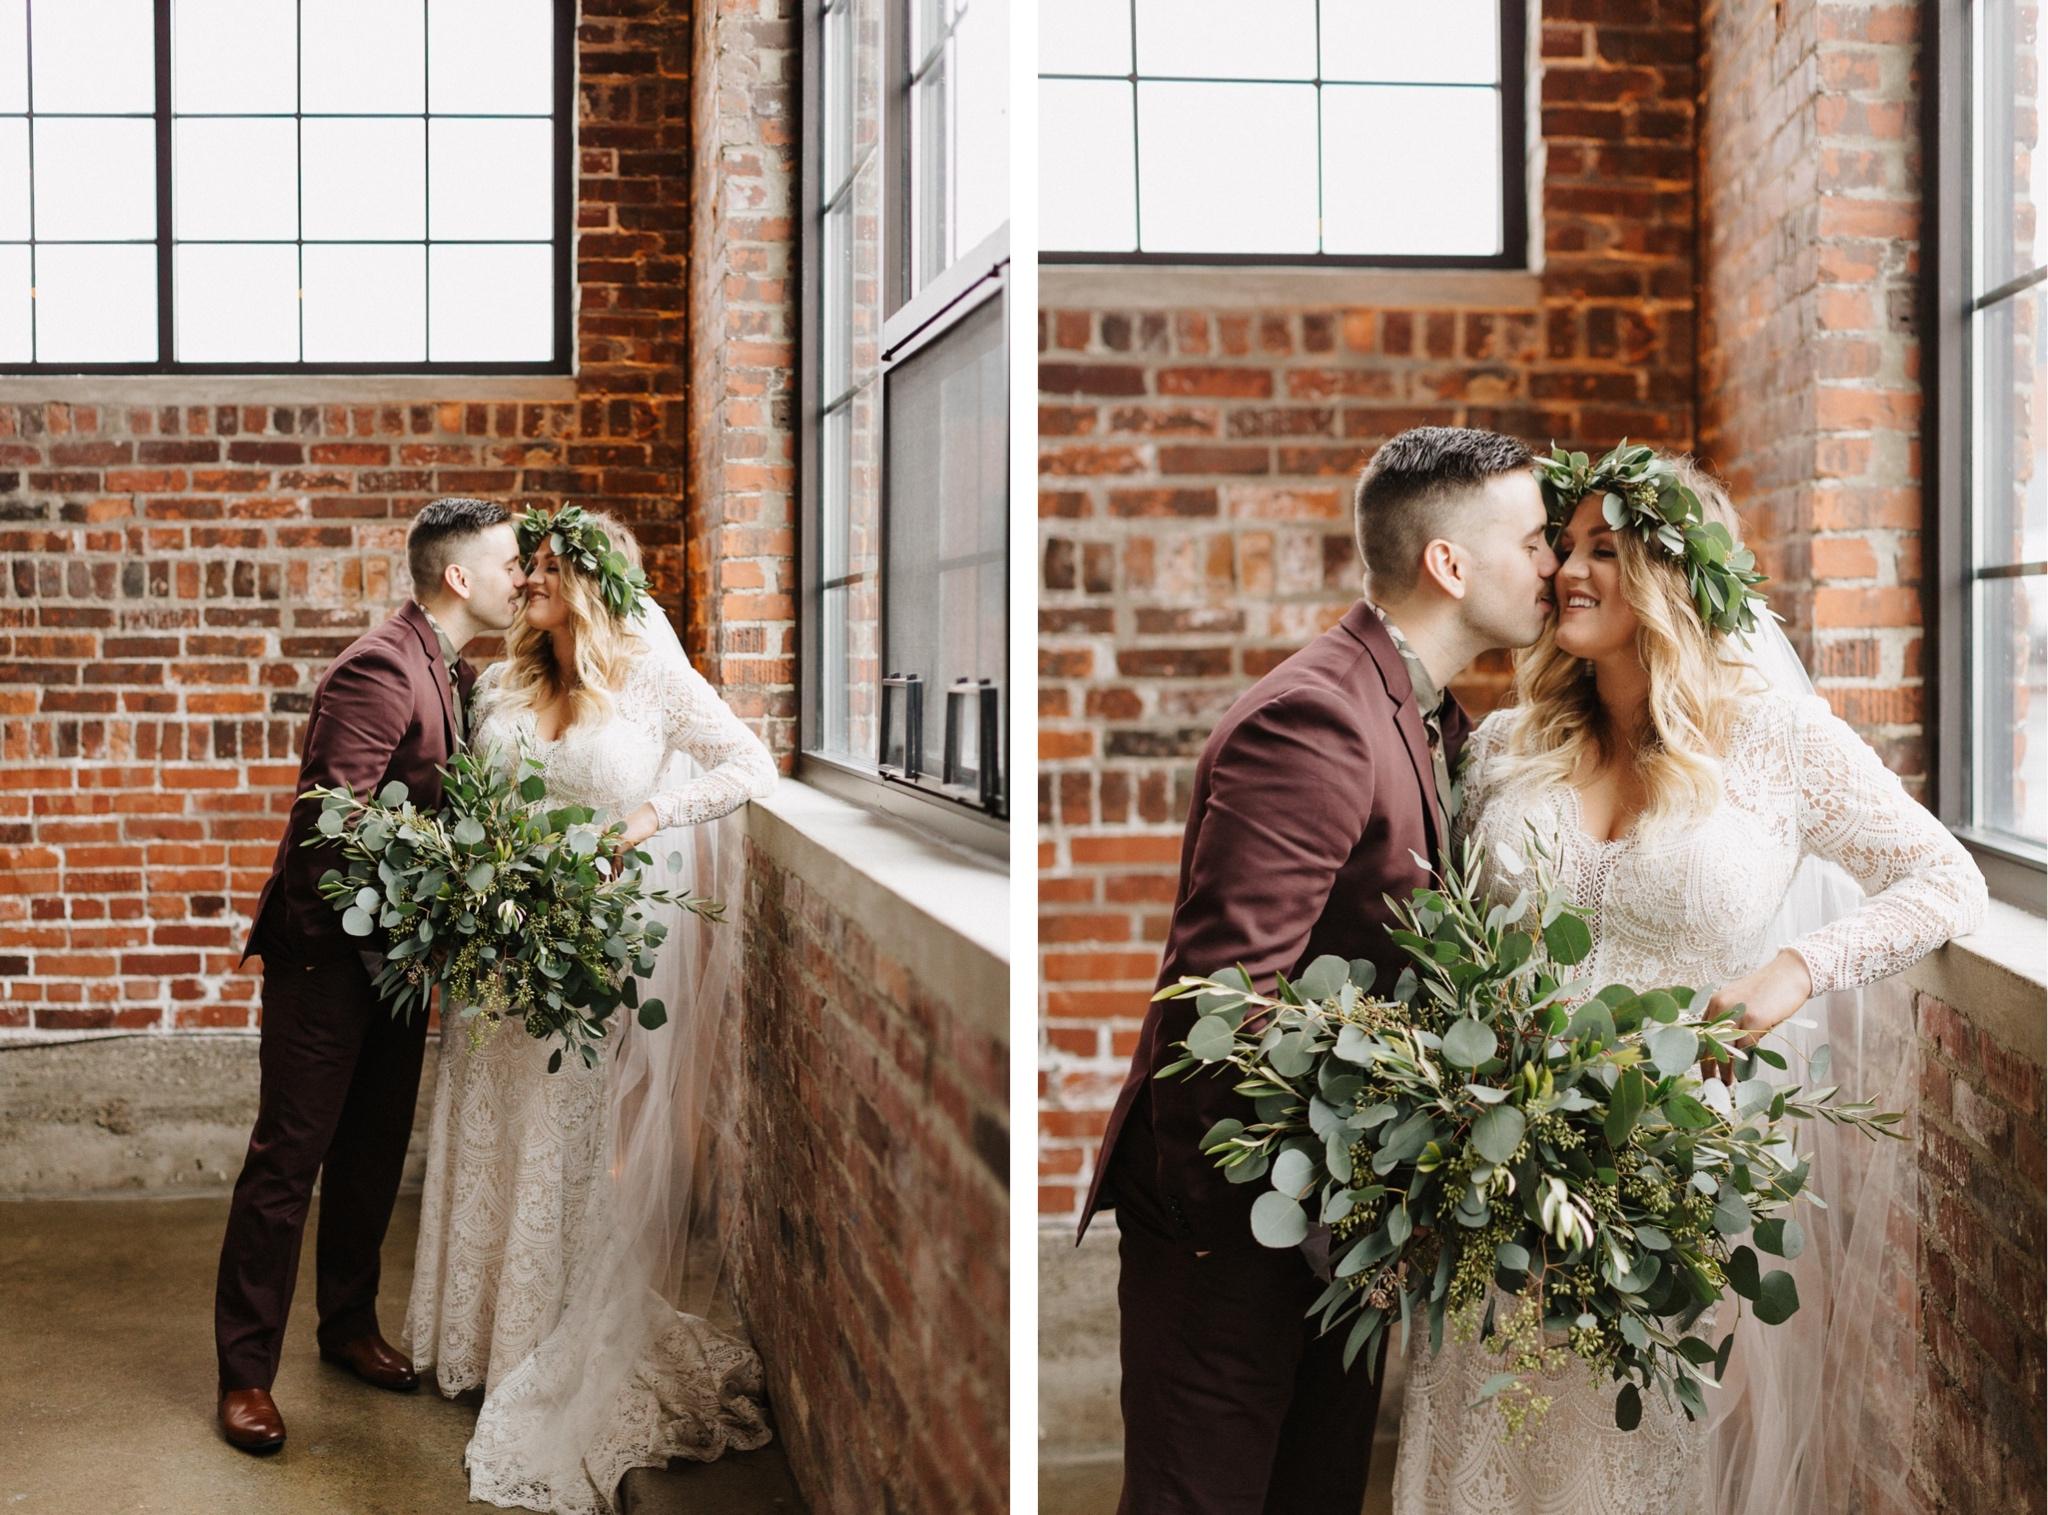 30_19-03-30 Caylen and Max Wedding Previews-64_19-03-30 Caylen and Max Wedding Previews-63.jpg